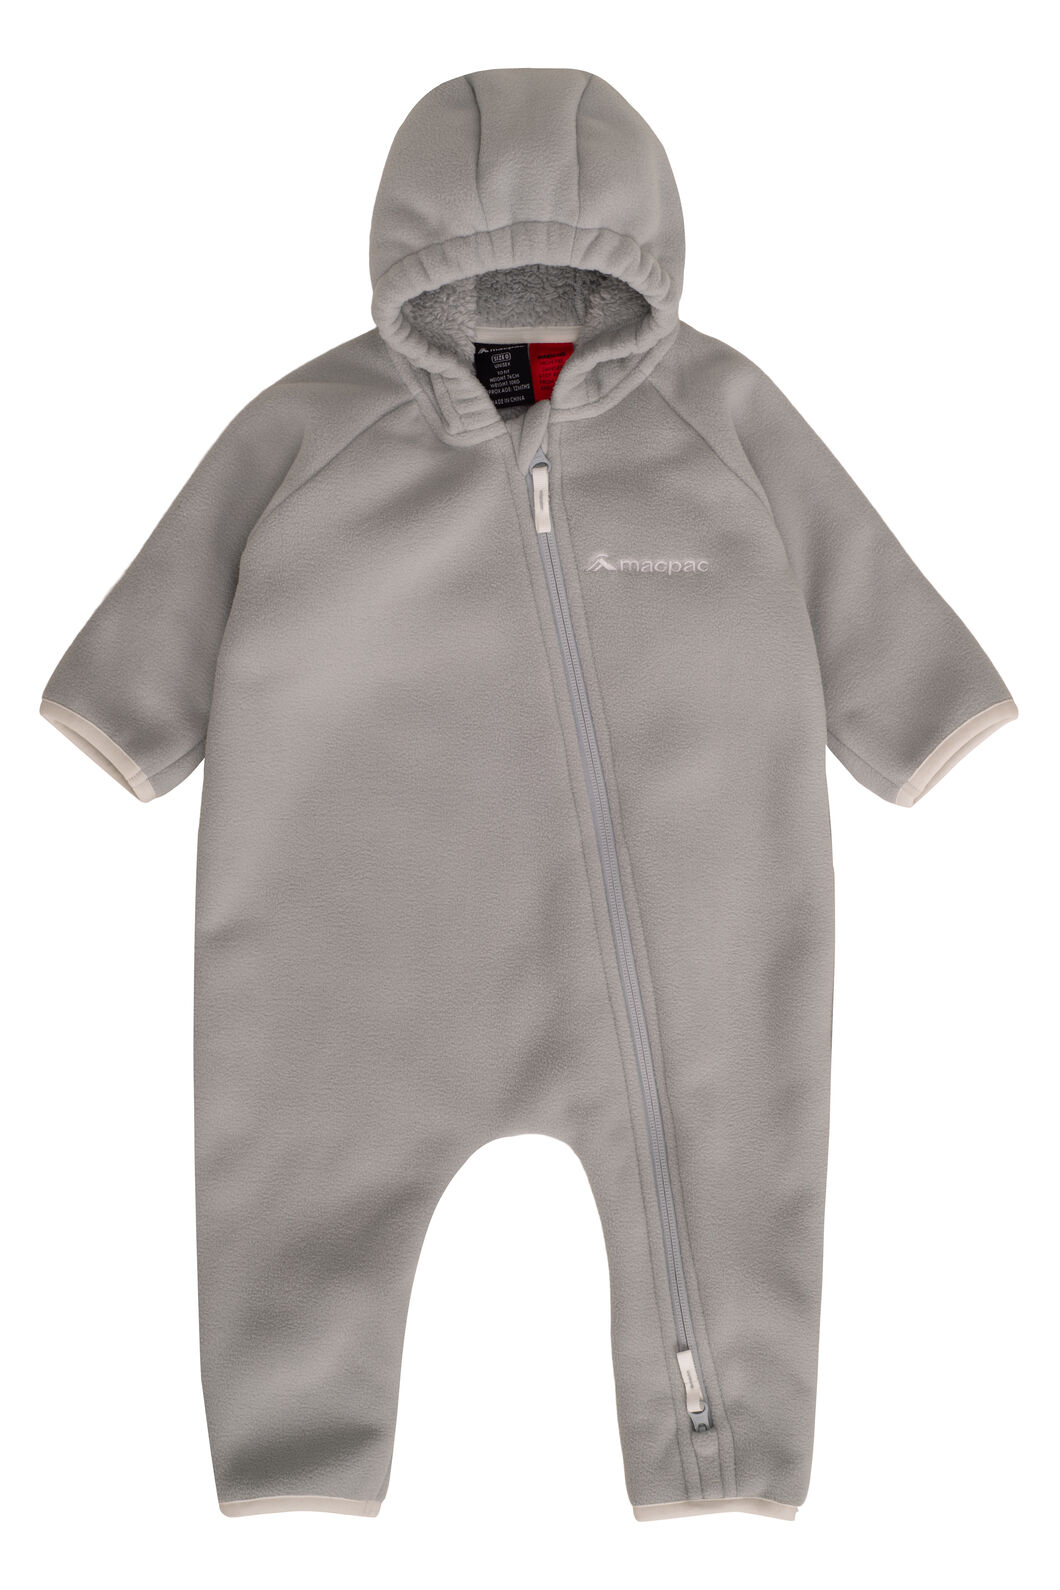 Macpac Acorn Fleece Onesie — Baby, High Rise, hi-res